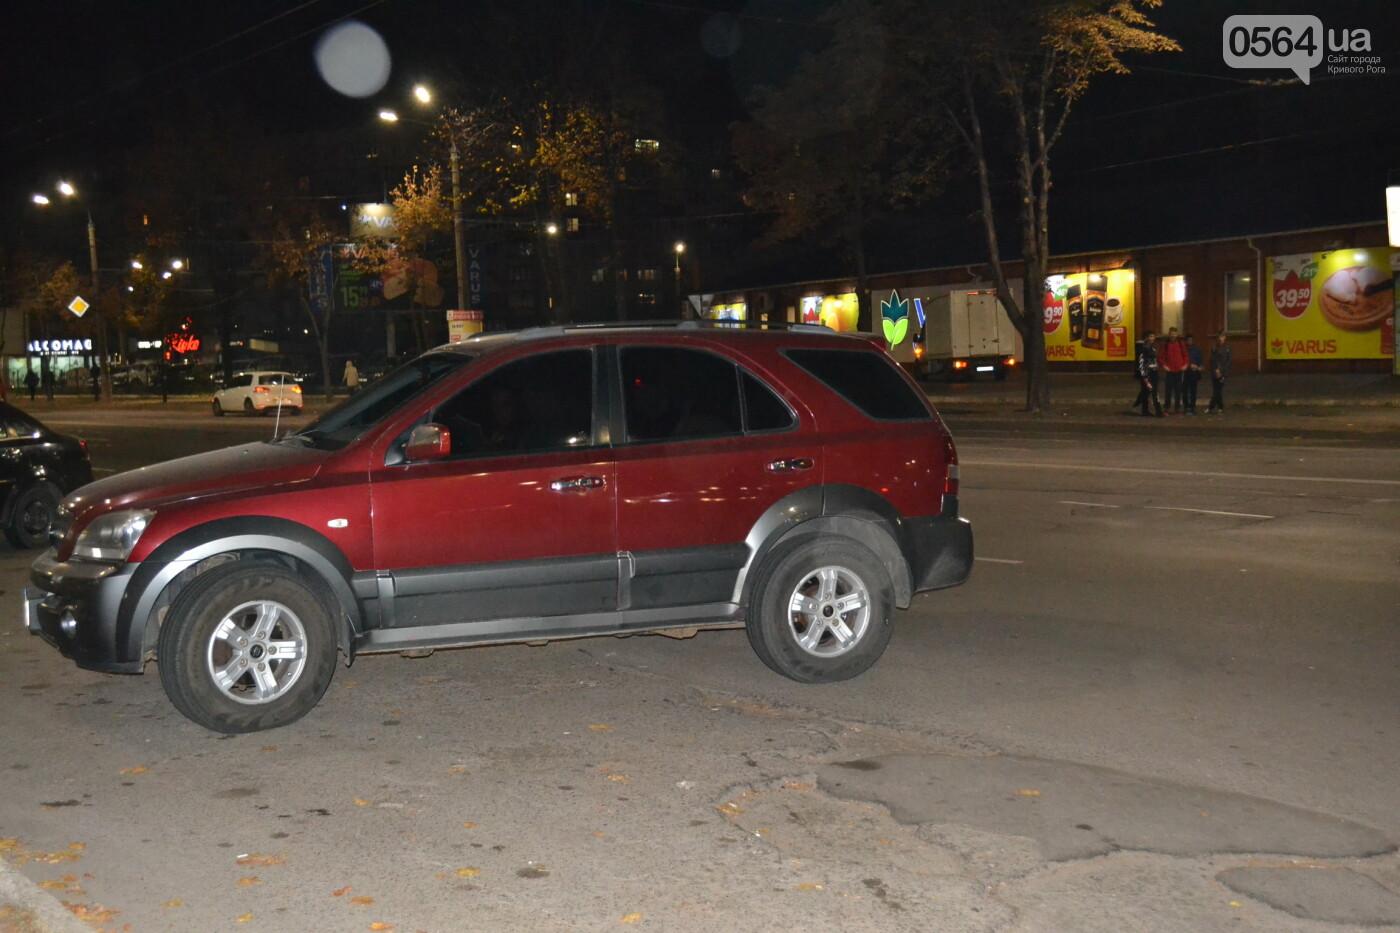 На проспекте Мира в Кривом Роге столкнулись Lanos и Kia, - ФОТО, ВИДЕО, фото-19